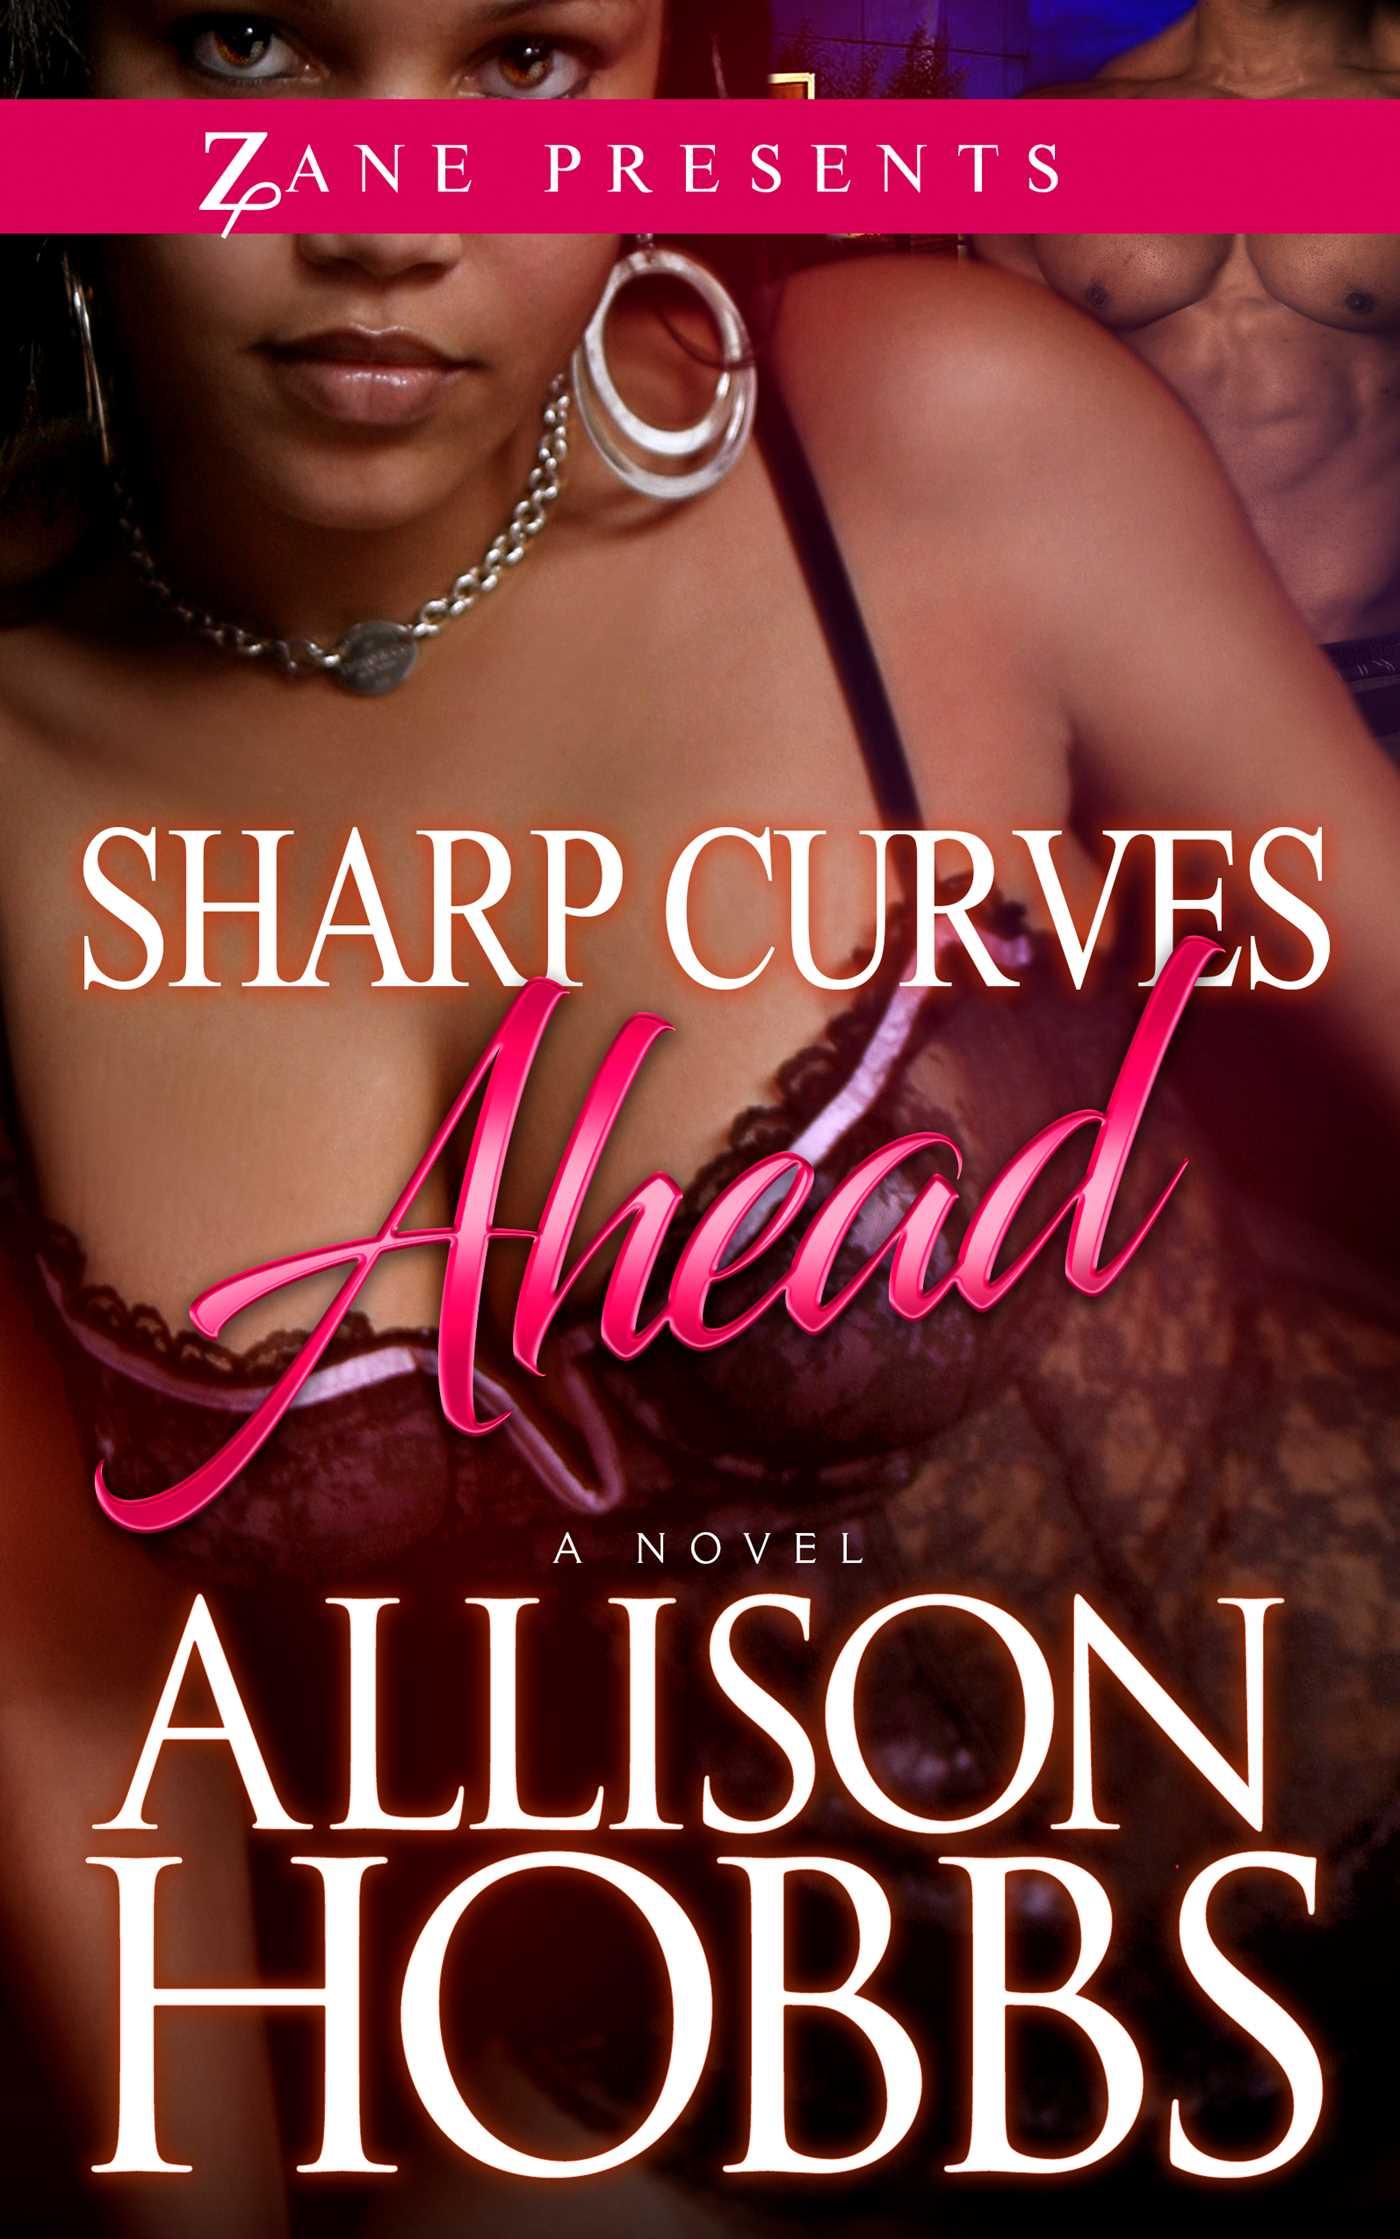 Sharp curves ahead 9781501119385 hr